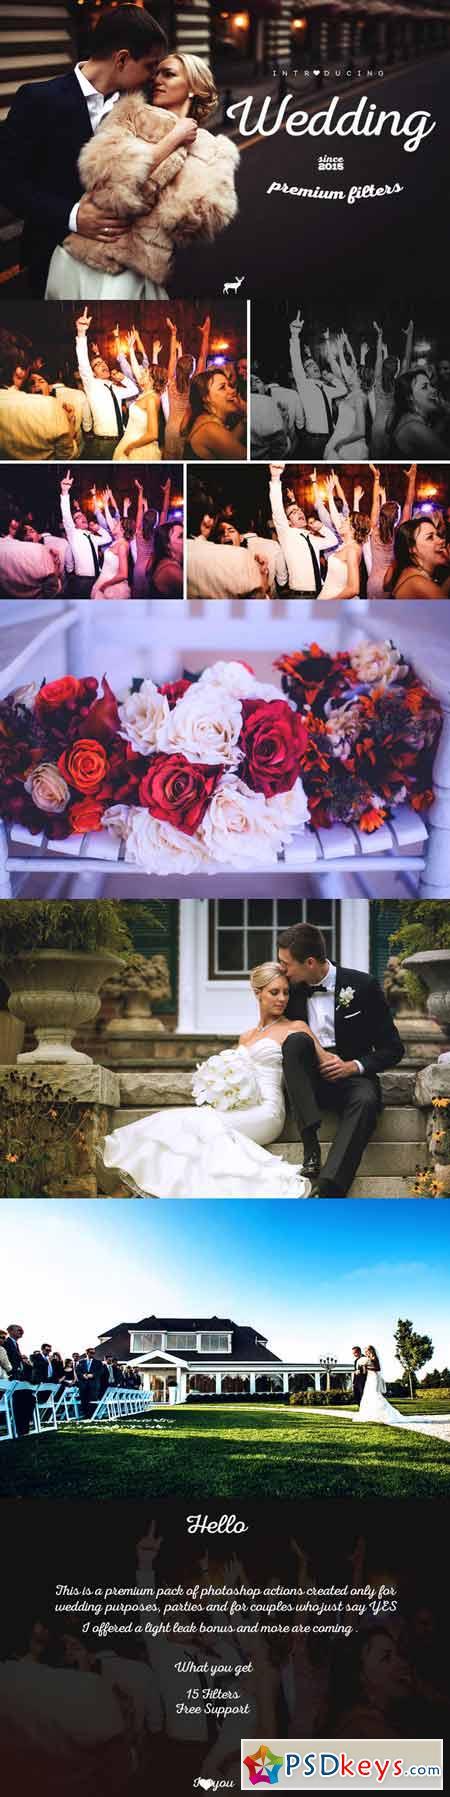 Wedding Premium Filters - PS Actions 417909